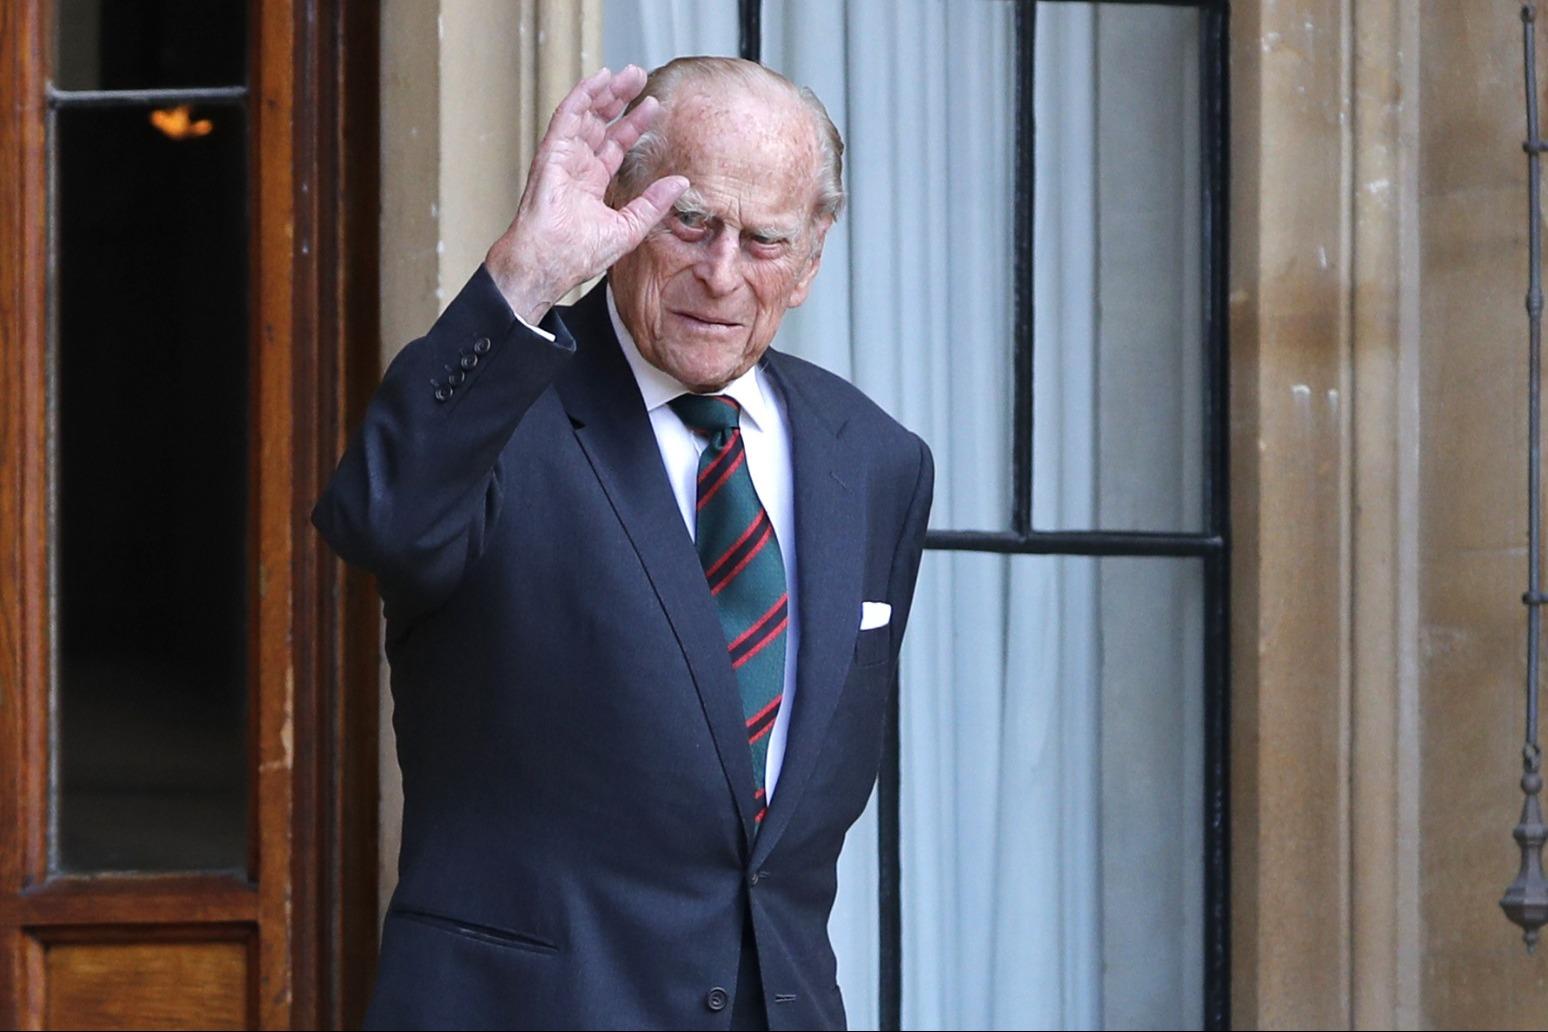 Political leaders unite in tribute to Duke of Edinburgh